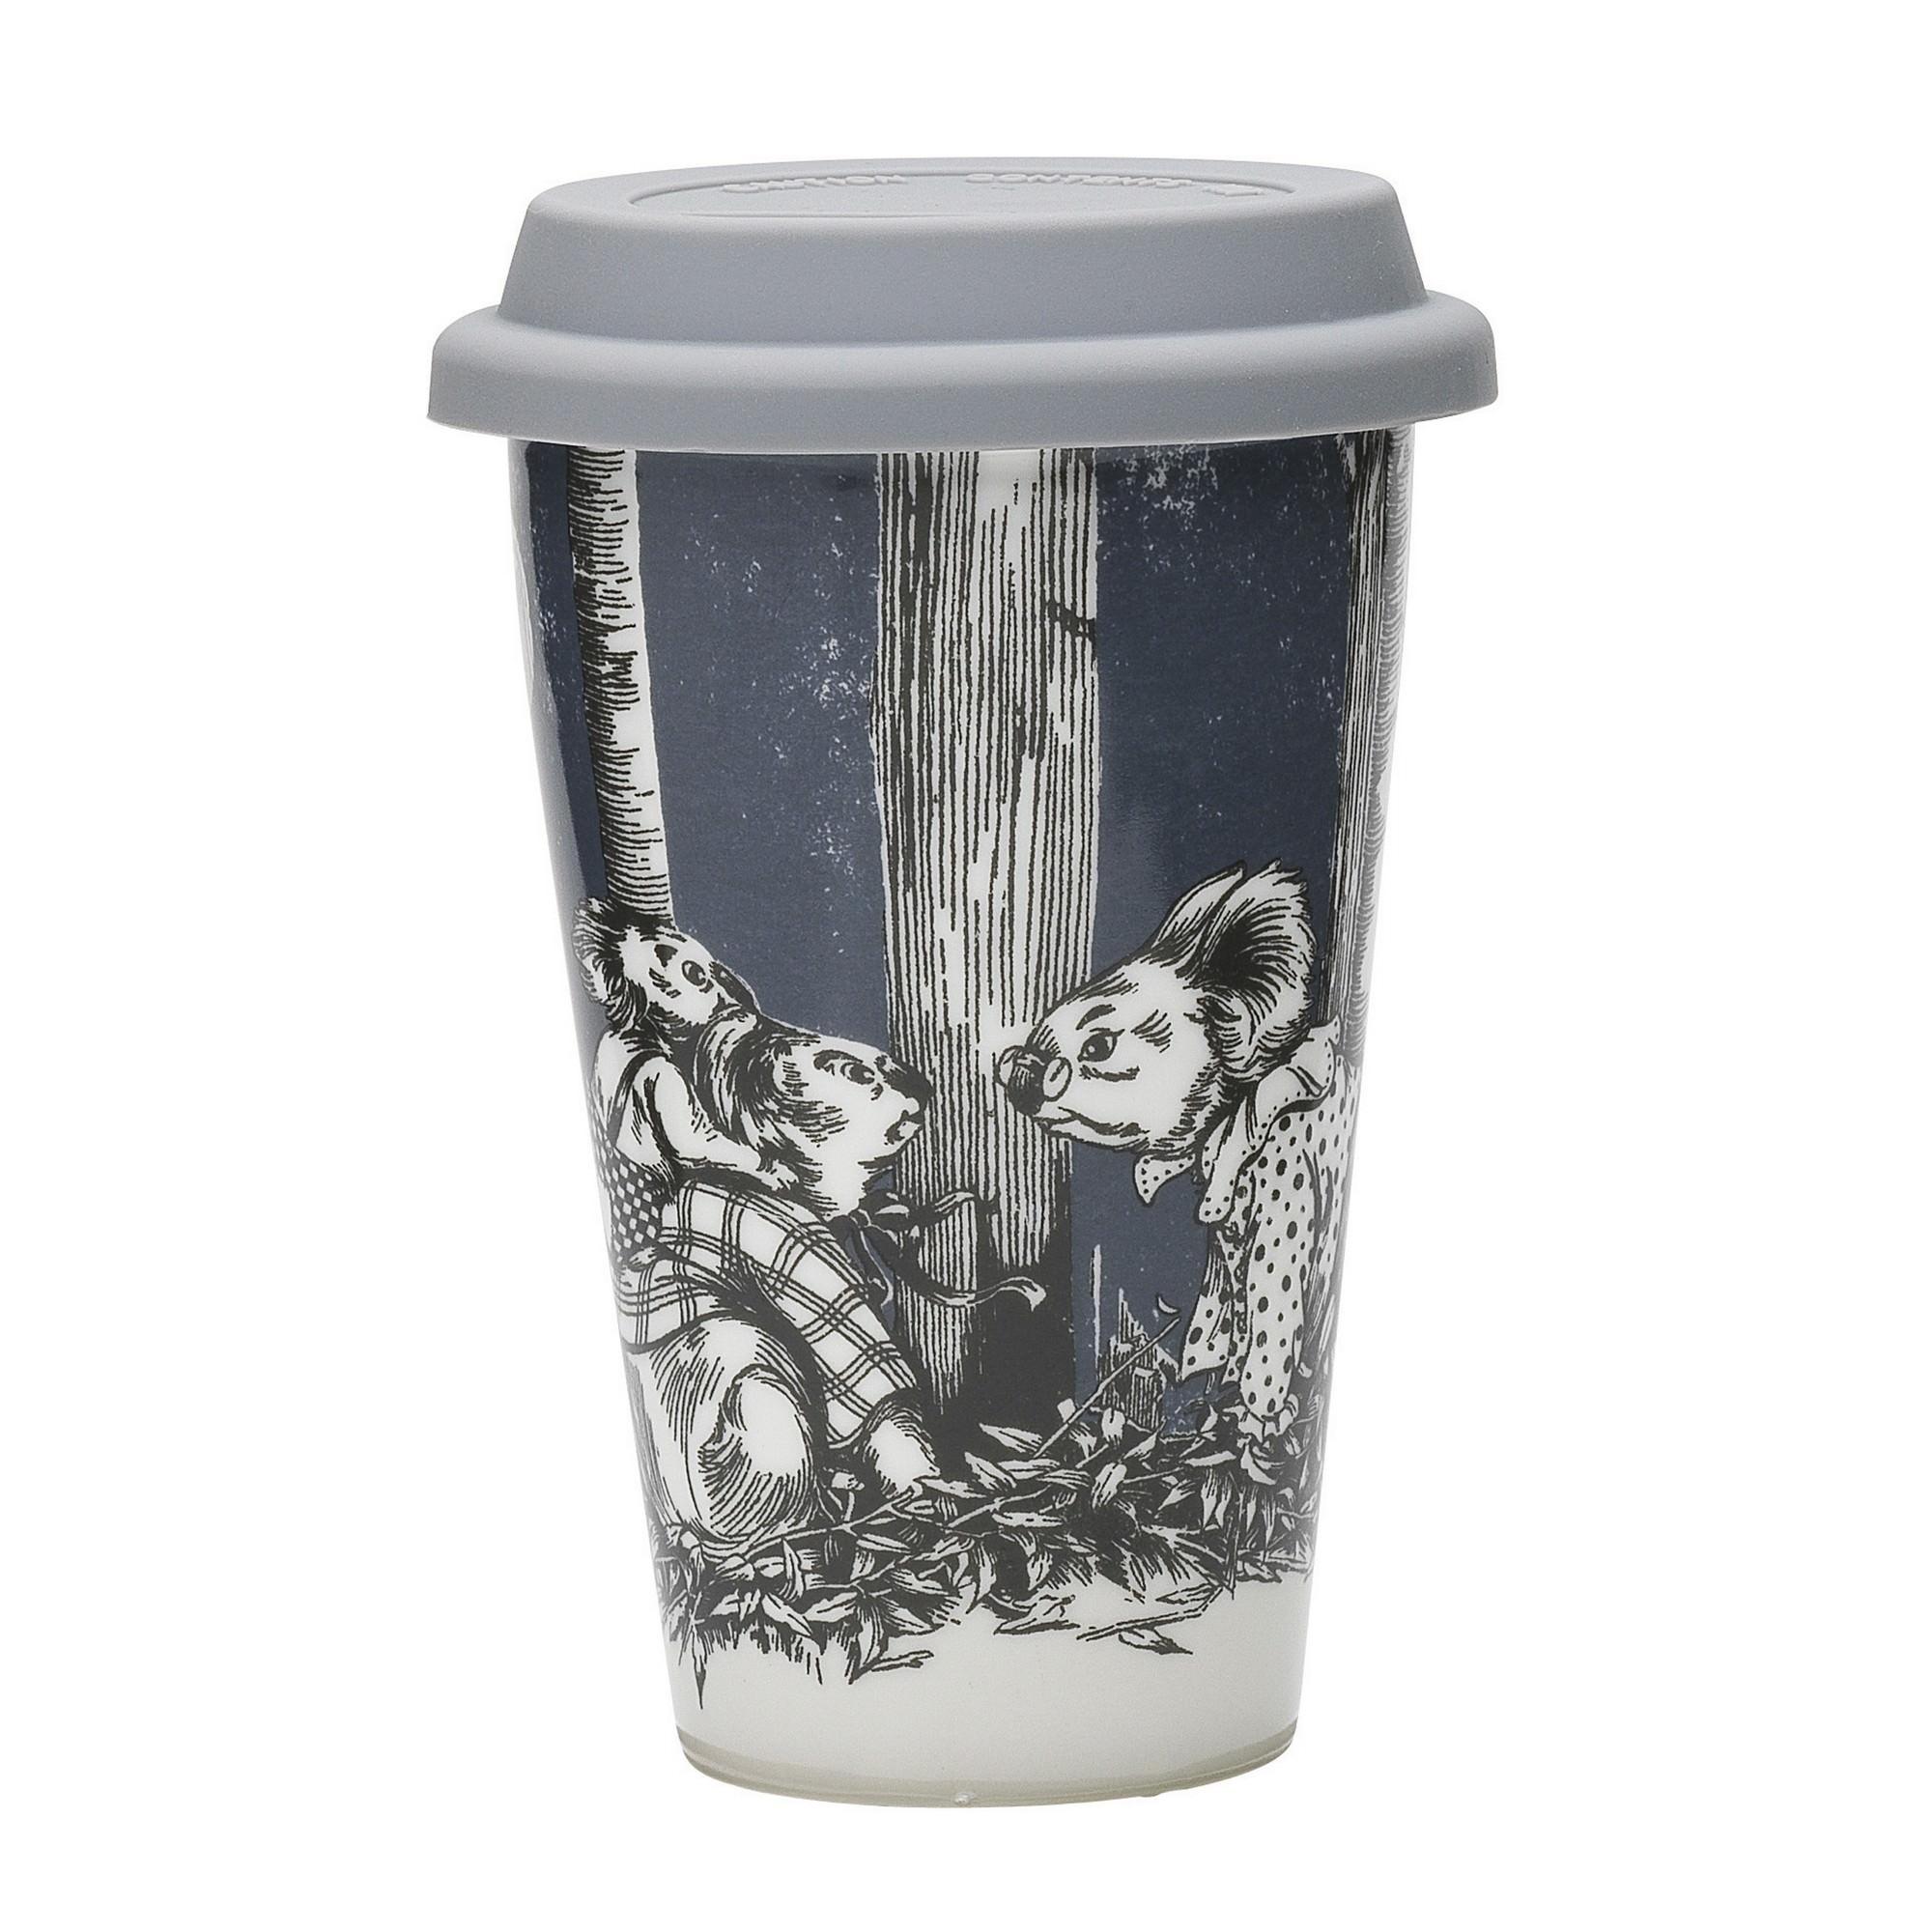 Ecology Blinky Bill New Bone China Travel Mug, Ink